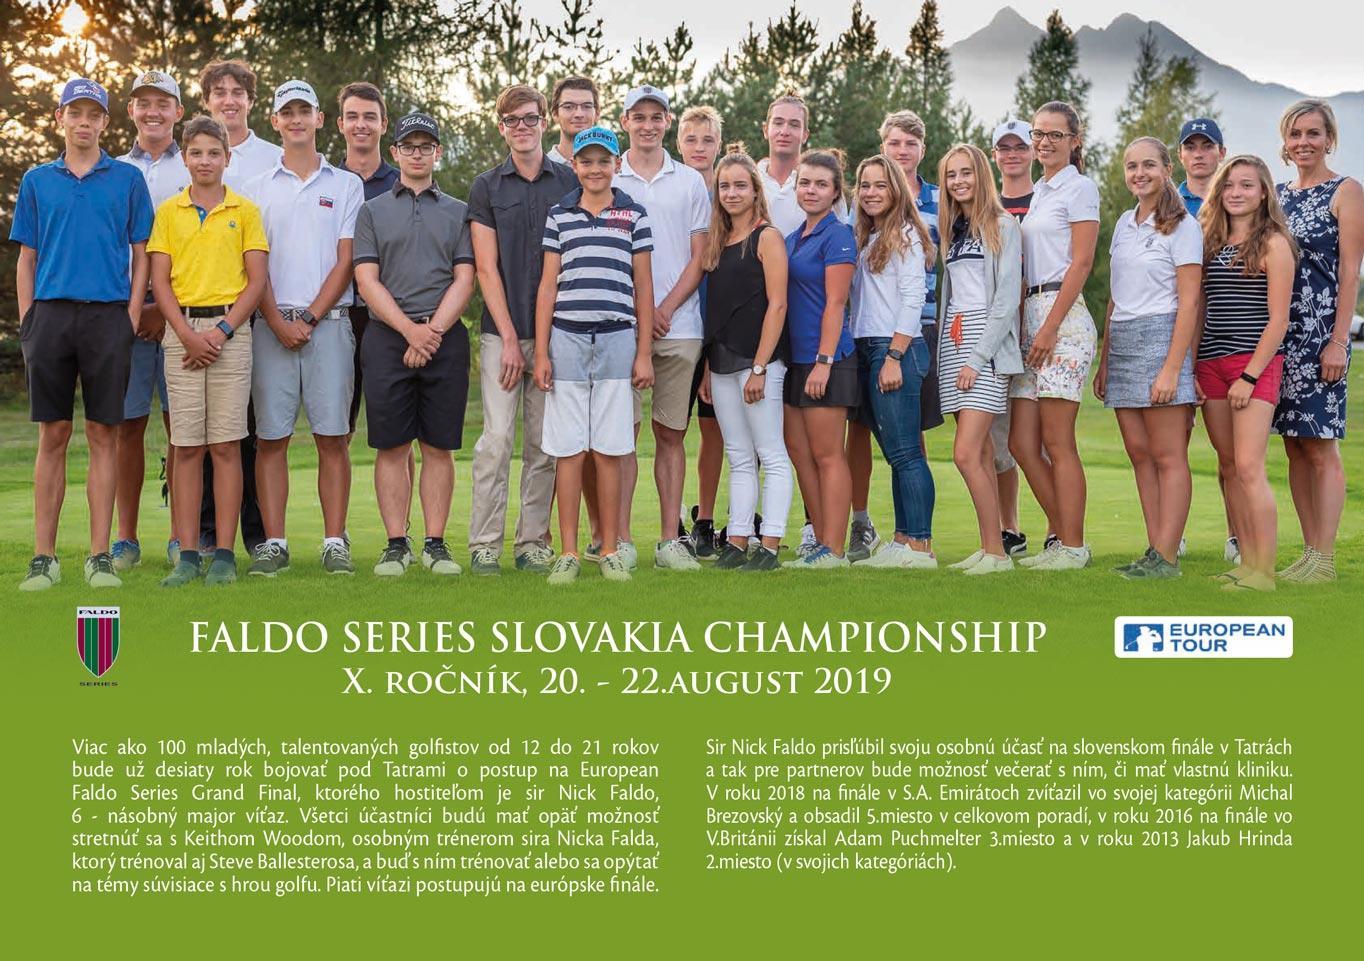 Faldo series Slovakia Championship 2019